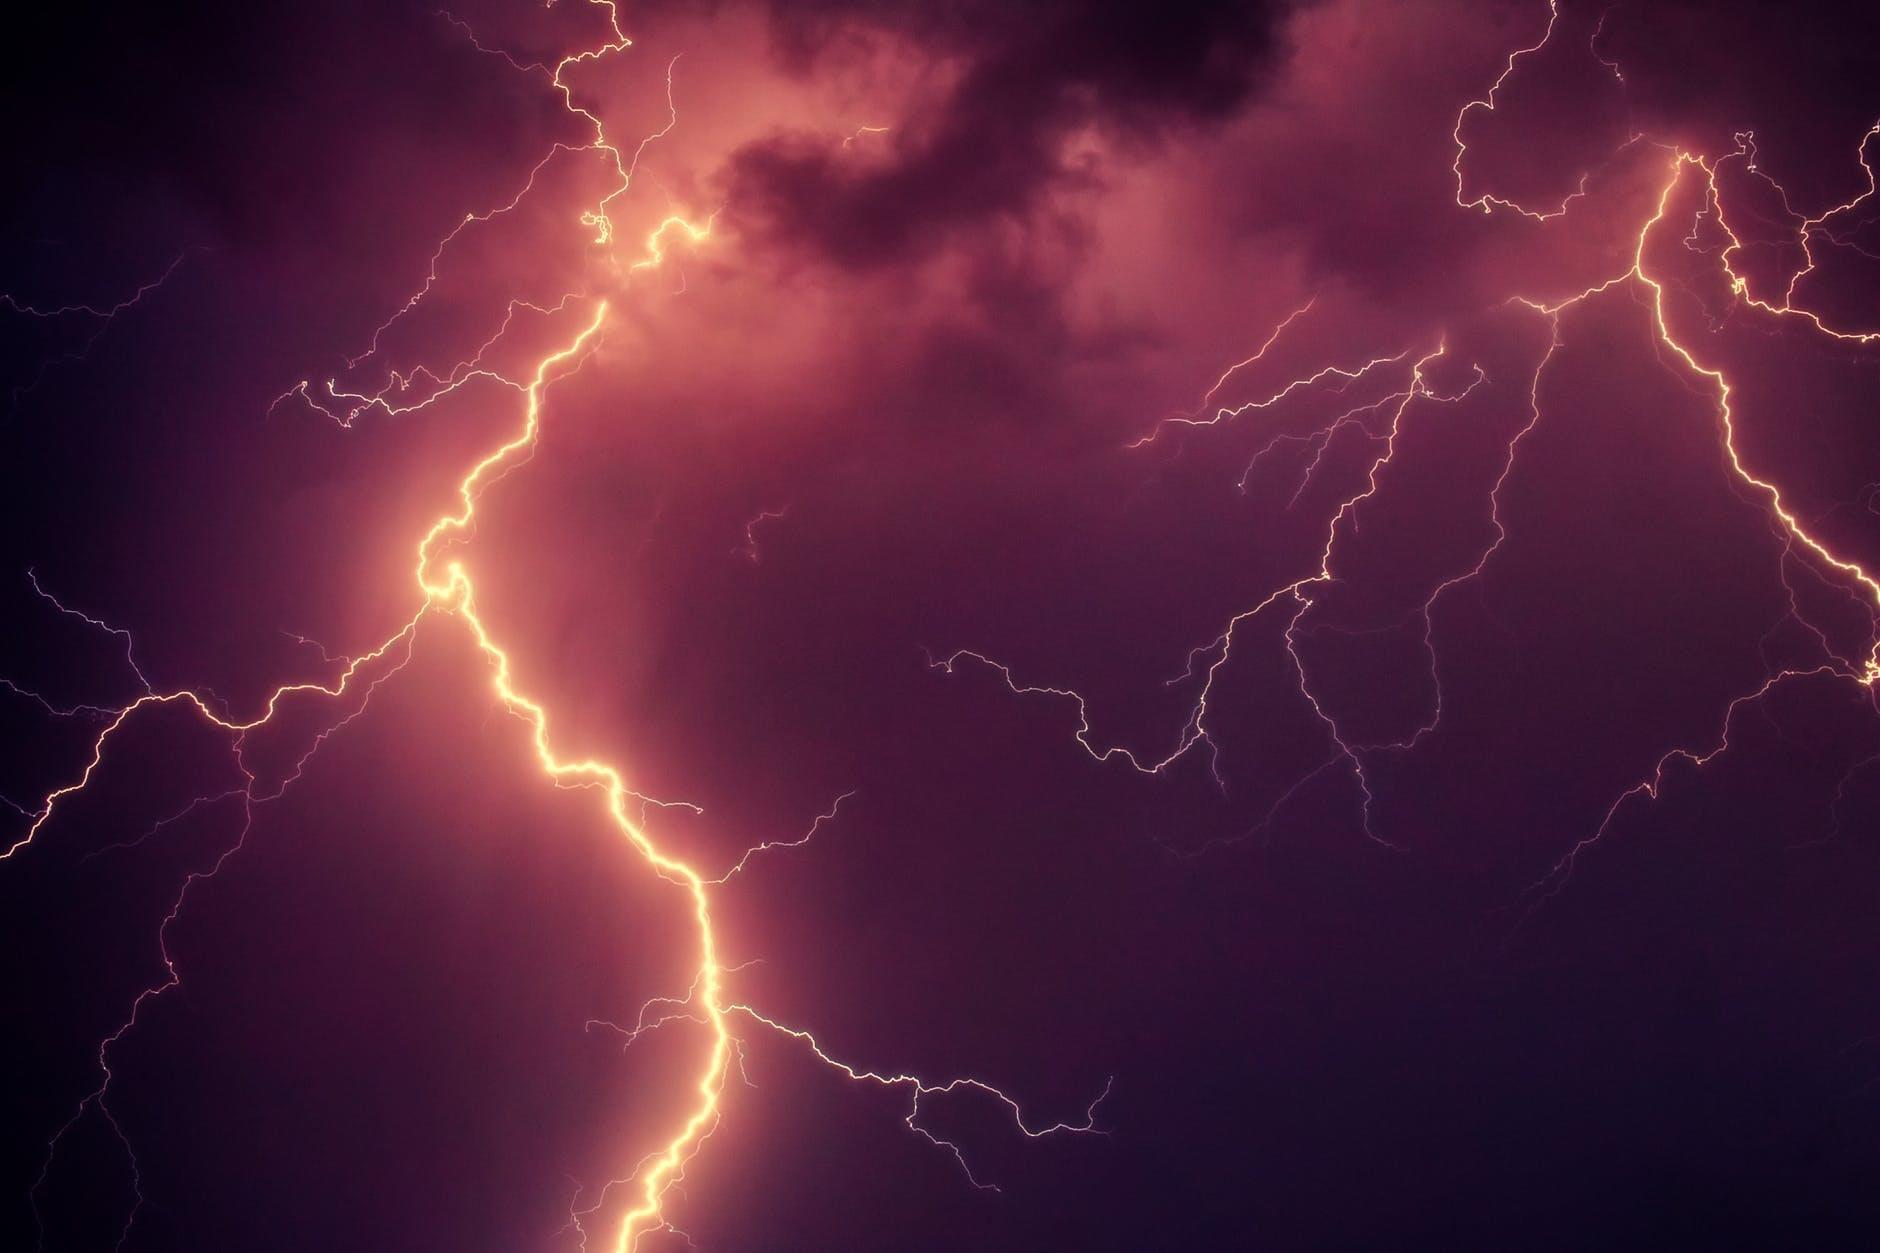 Lightning kills 20 in Bihar, heavy rainfall expected in state till Sunday